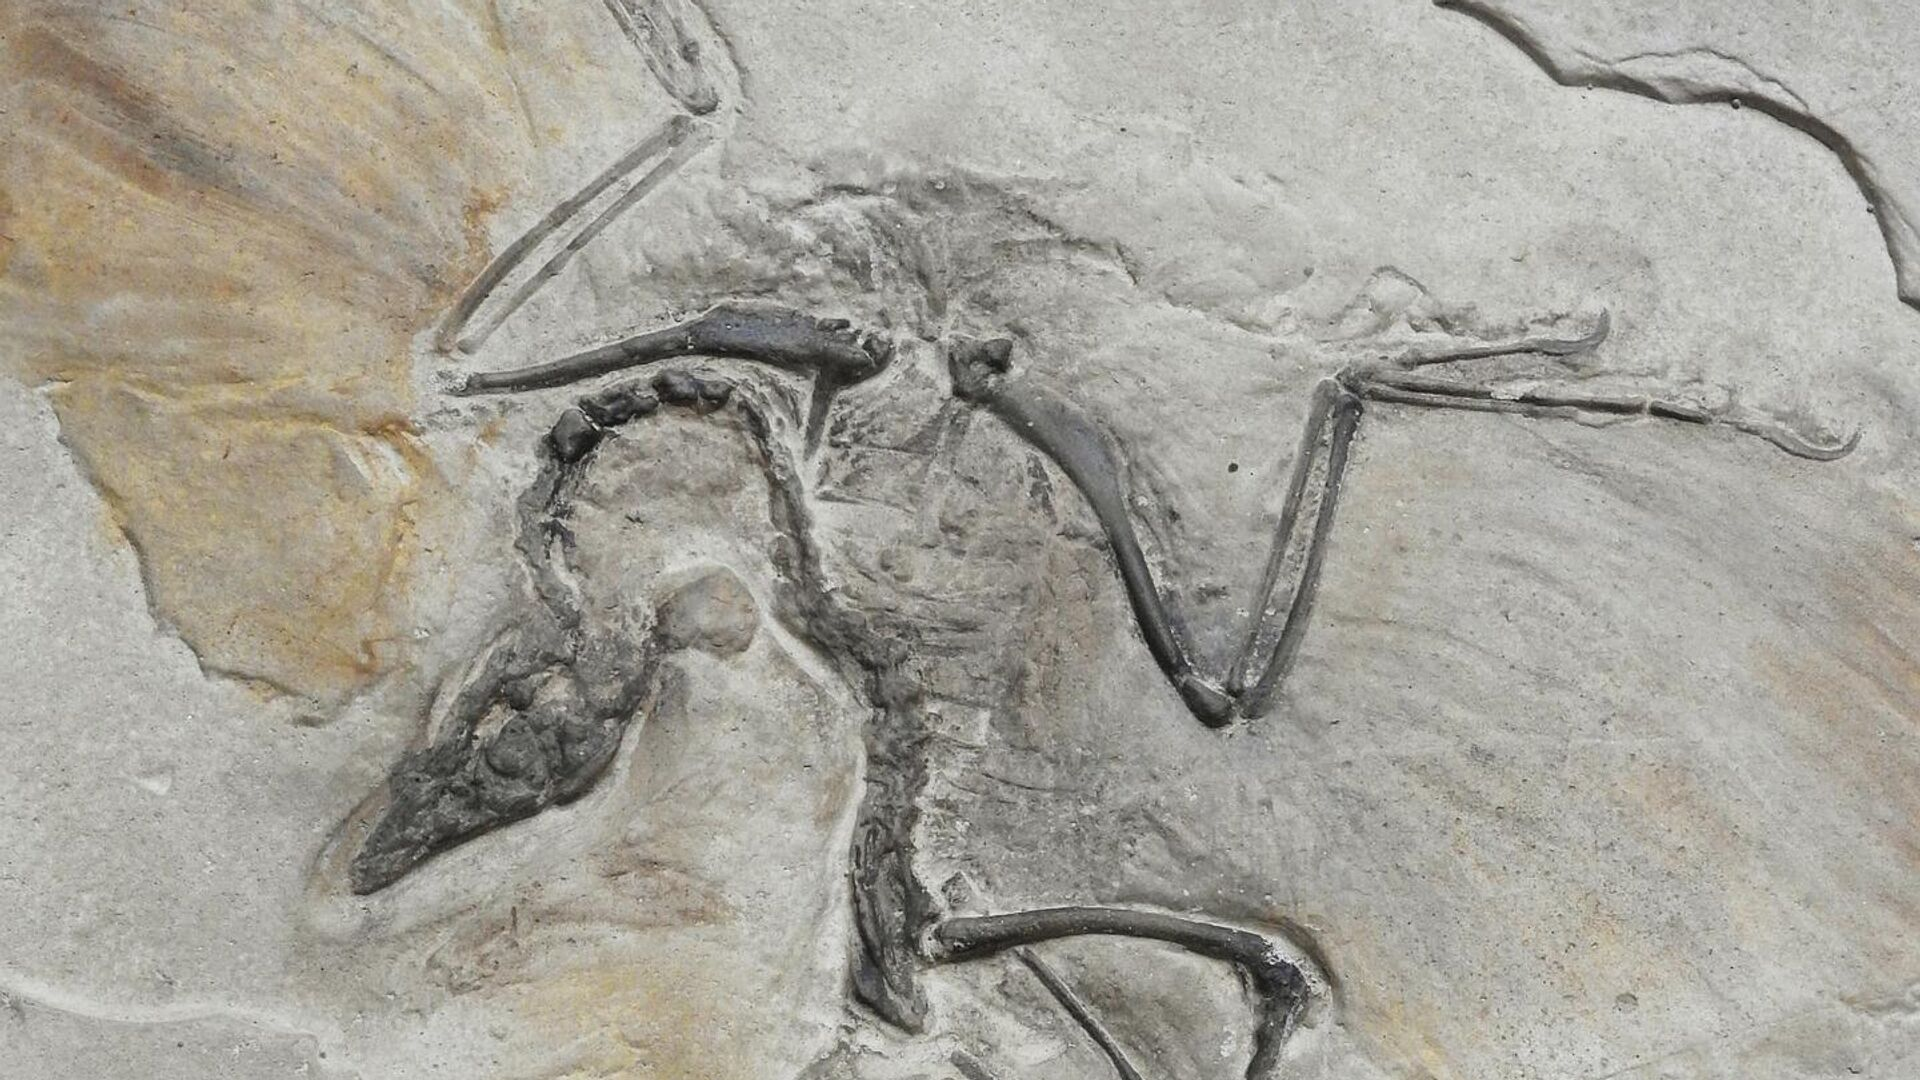 El fósil de un ave (imagen referencial) - Sputnik Mundo, 1920, 17.09.2021